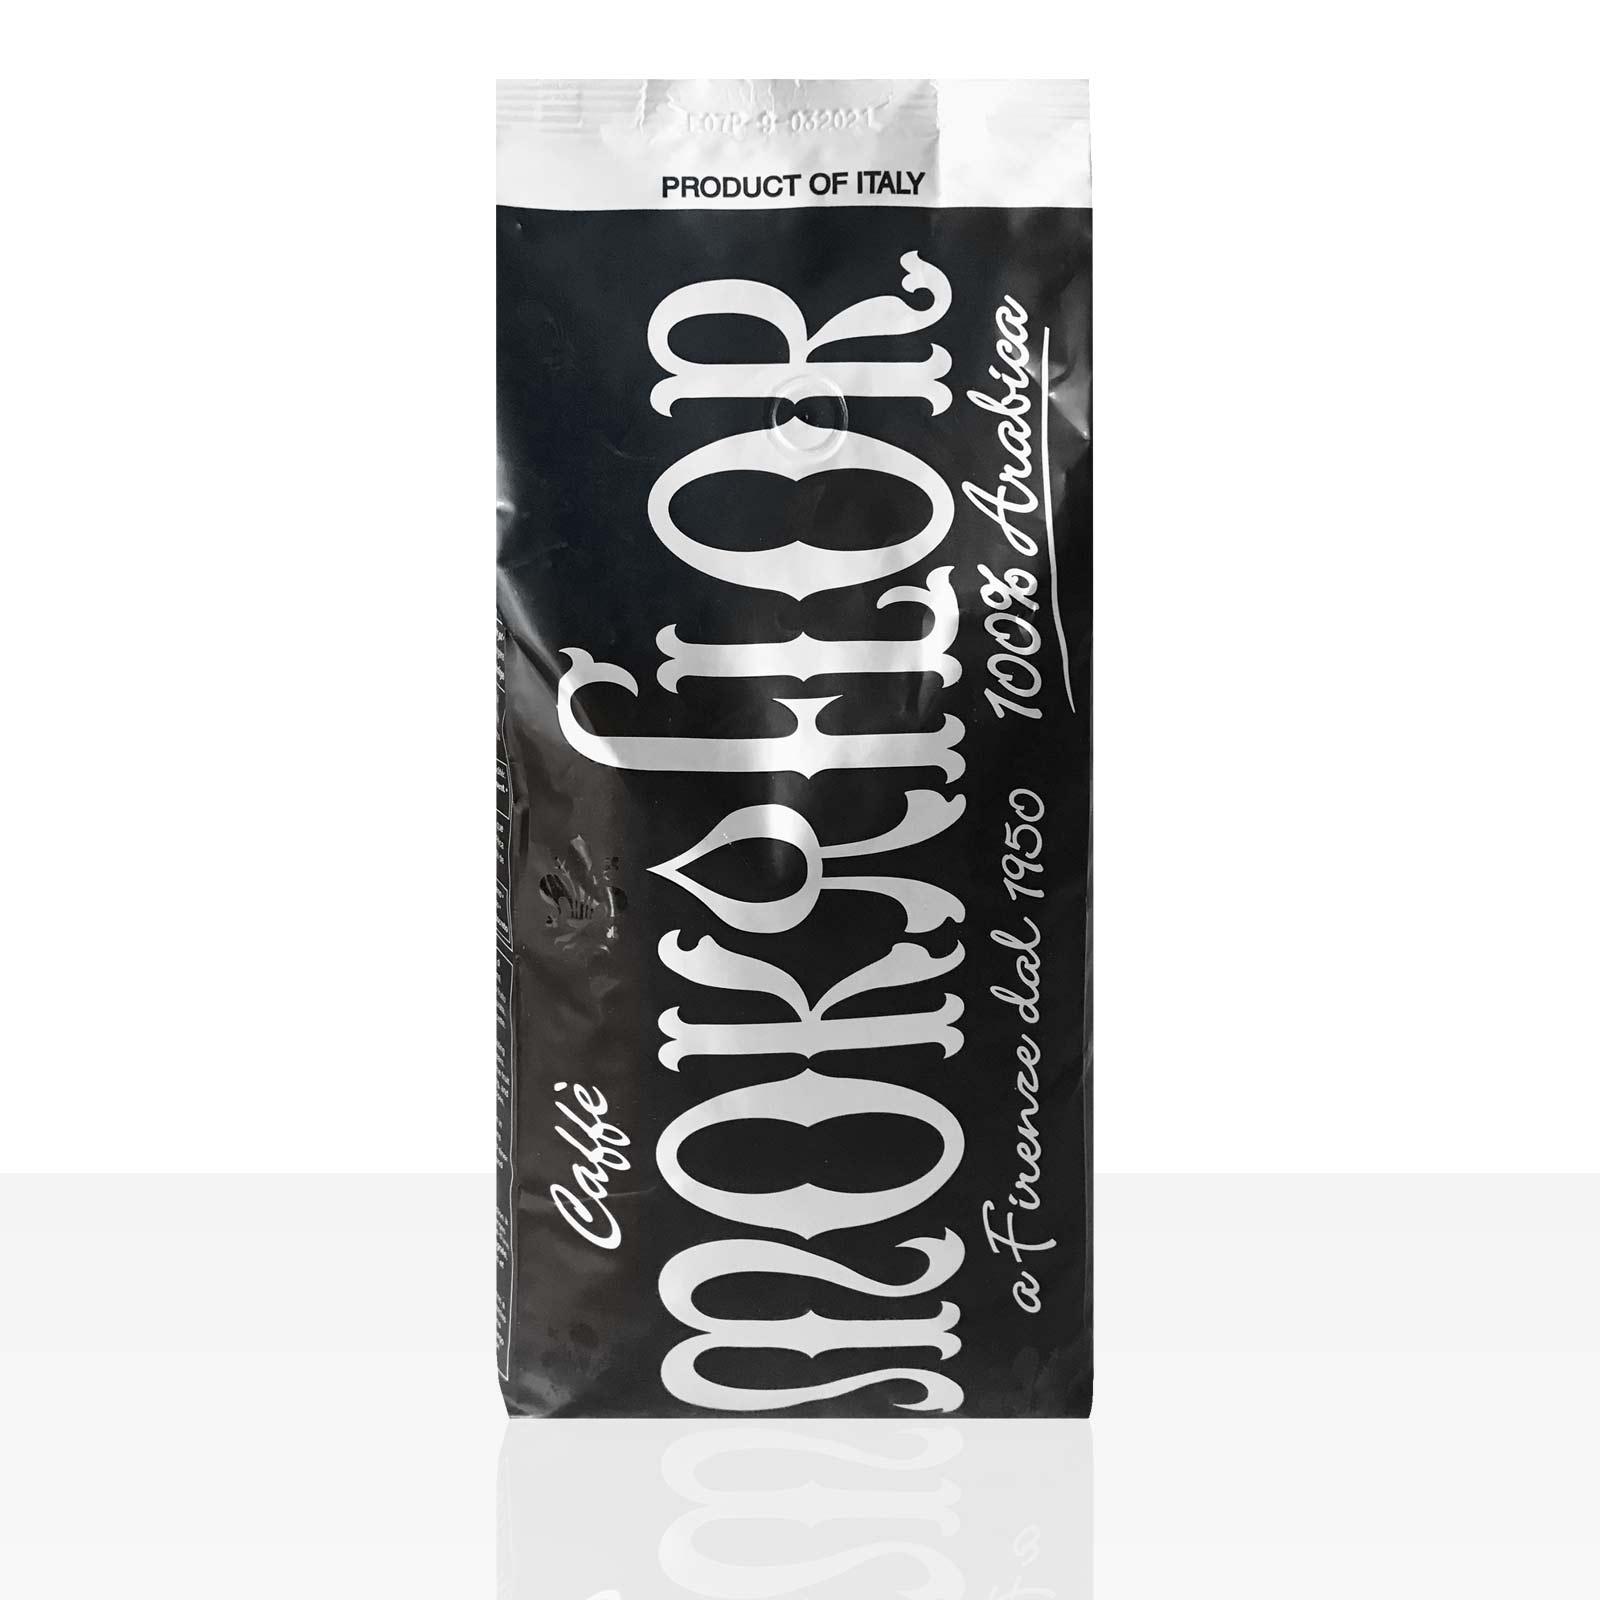 Mokaflor Miscela Espresso NERA 5 x 1kg Kaffee ganze Bohne, 100% Arabica